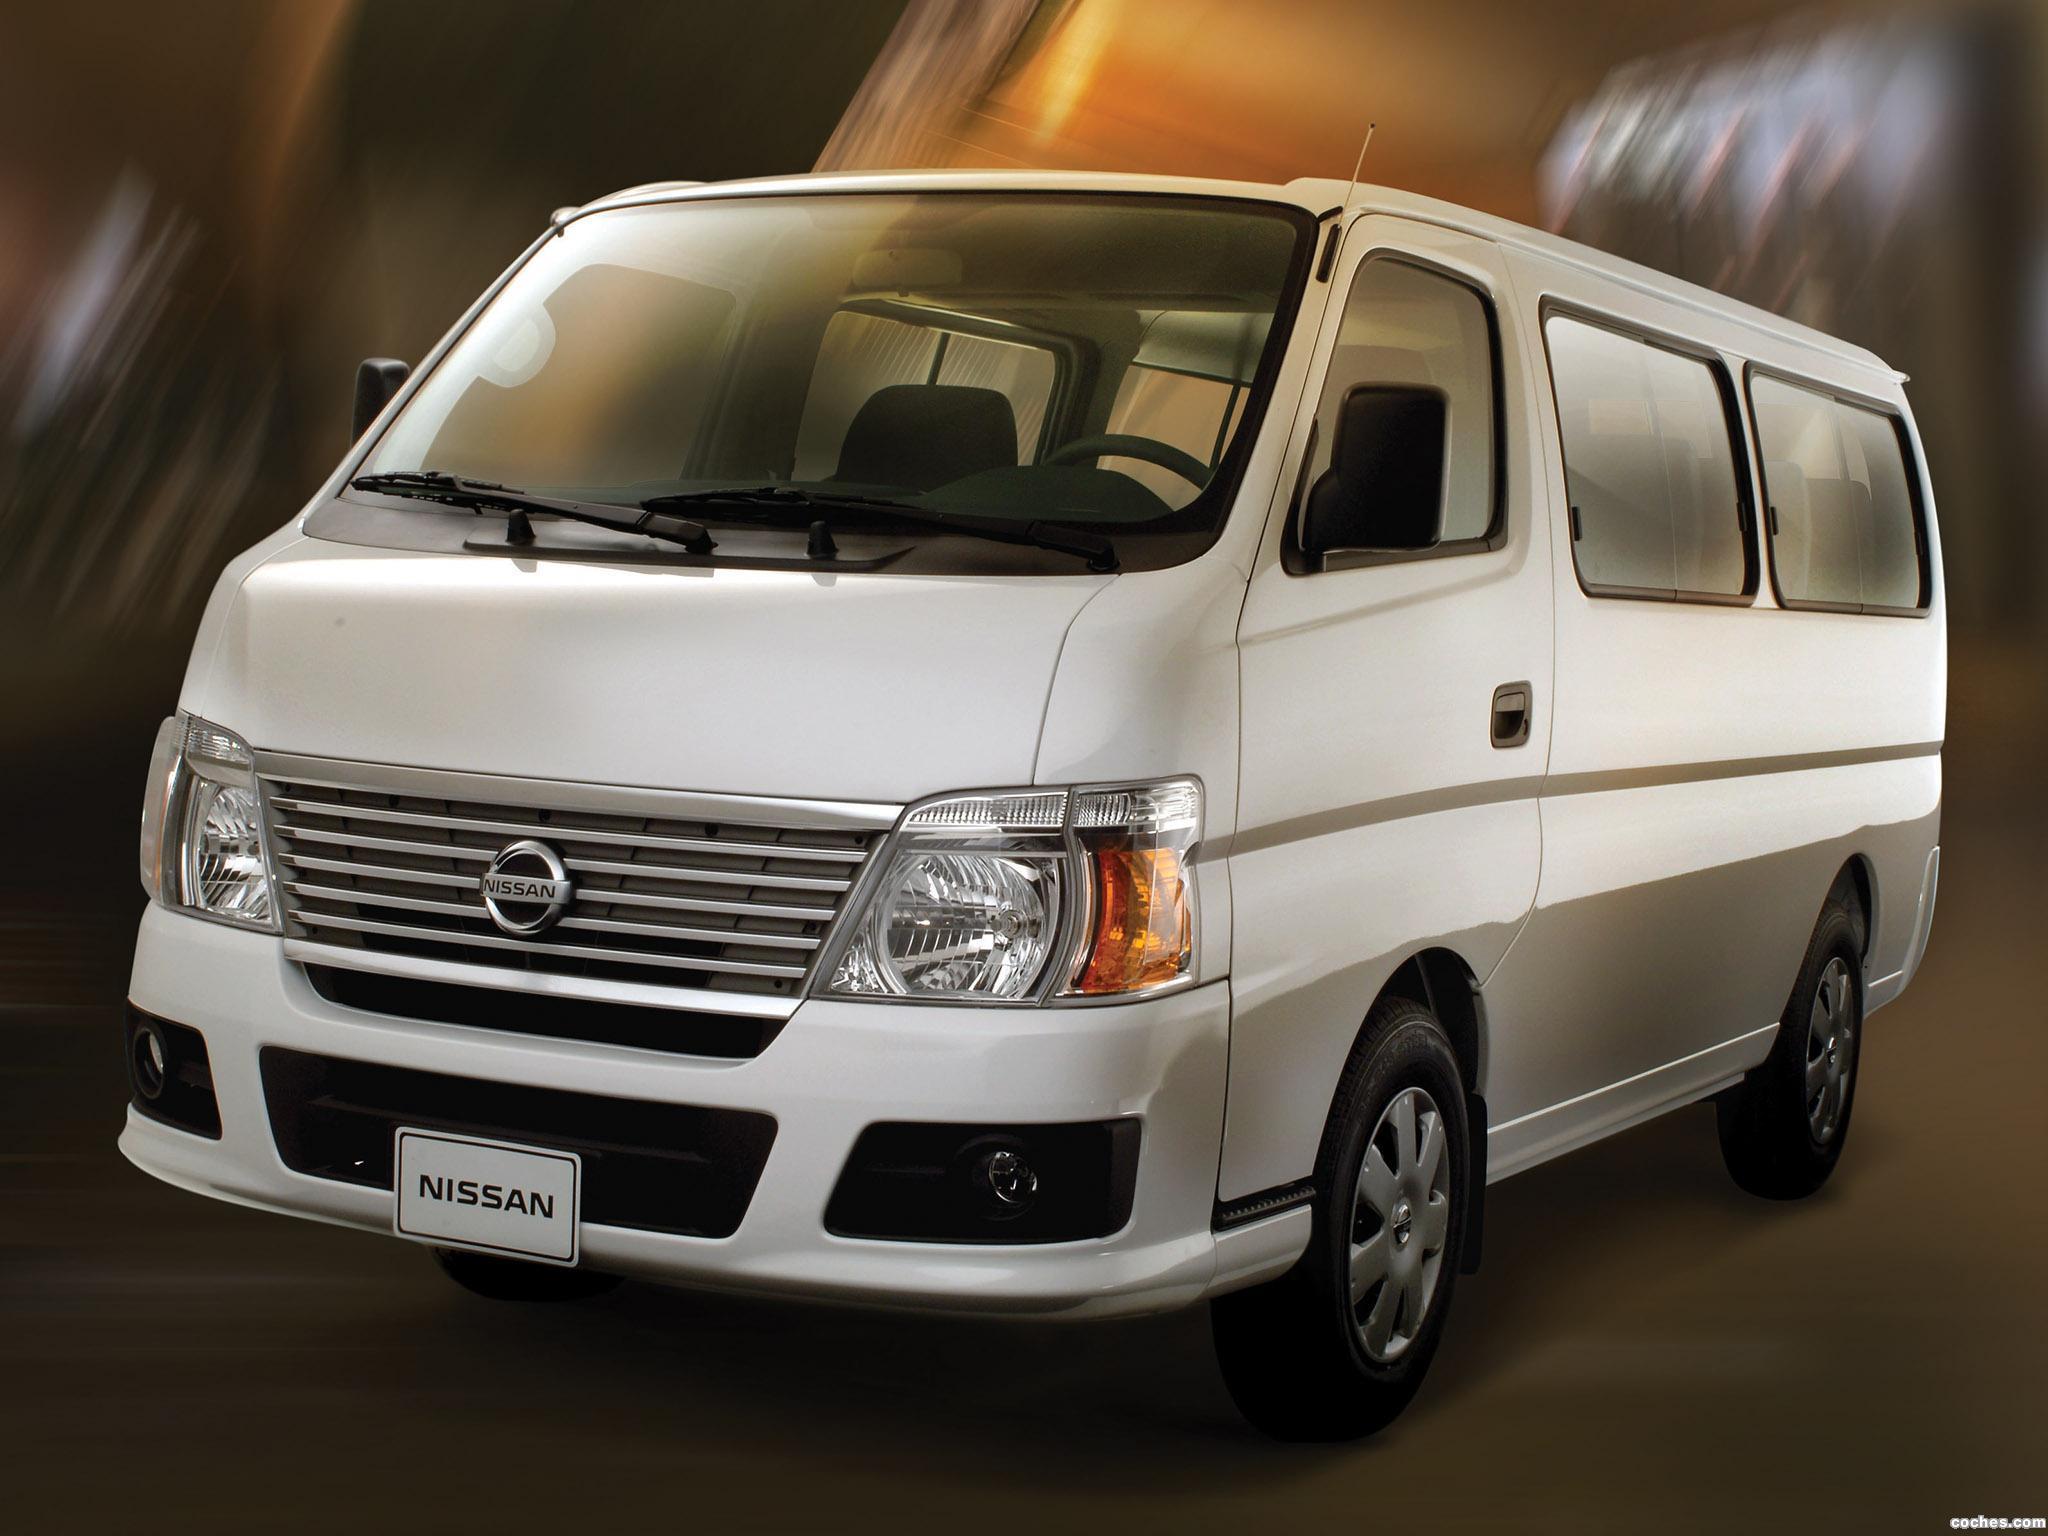 Foto 0 de Nissan Urvan Microbus 2007